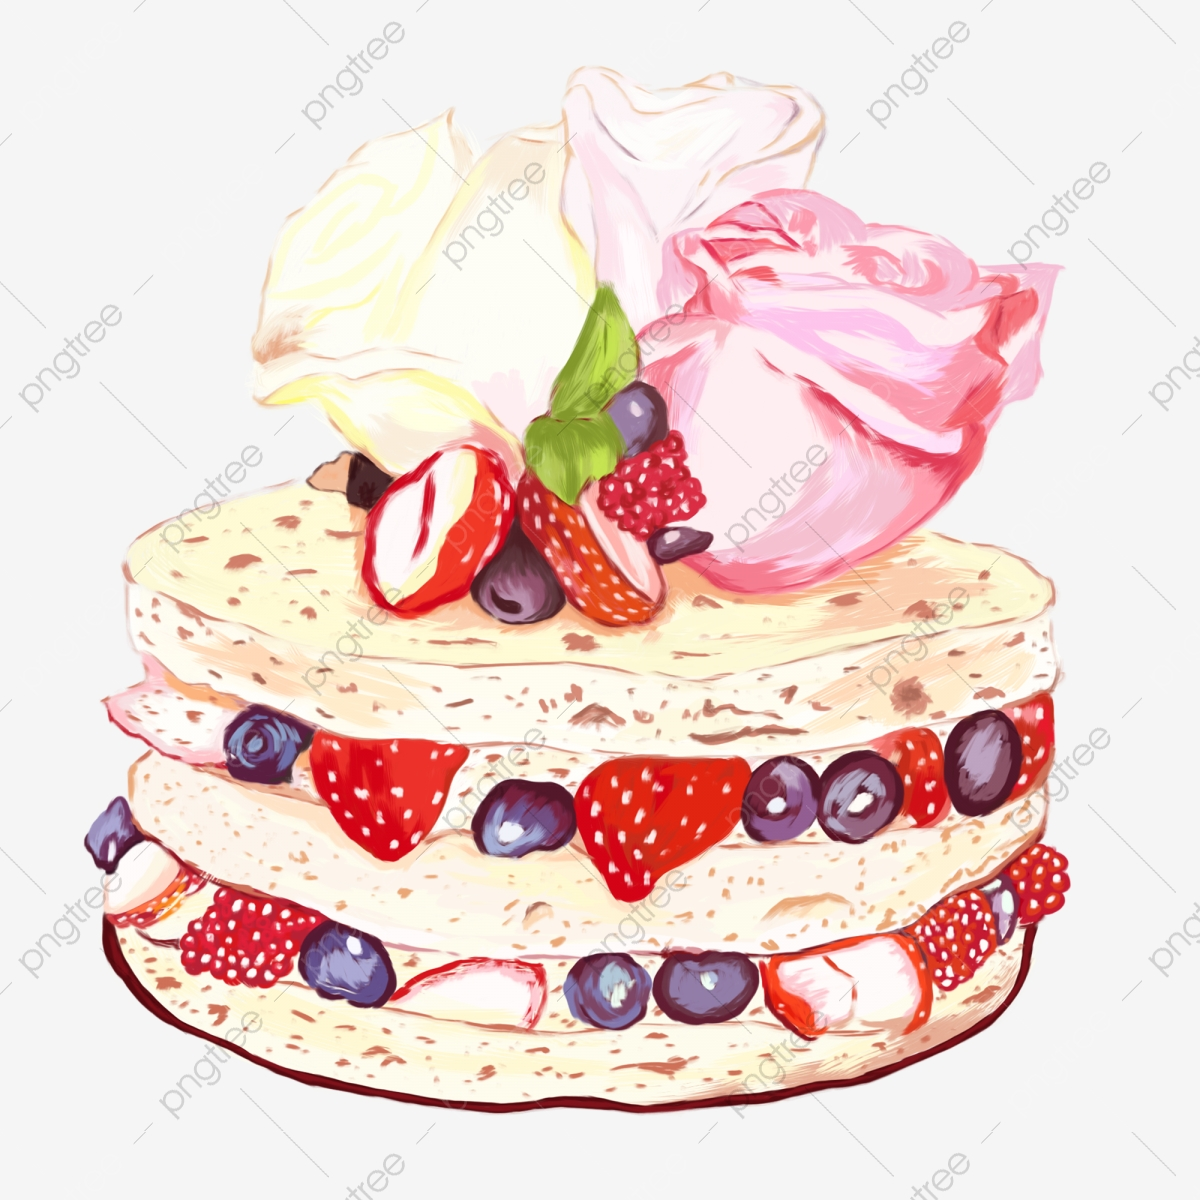 Awe Inspiring Cartoon Three Layer Strawberry Sandwich Cake Free Illustration Funny Birthday Cards Online Sheoxdamsfinfo